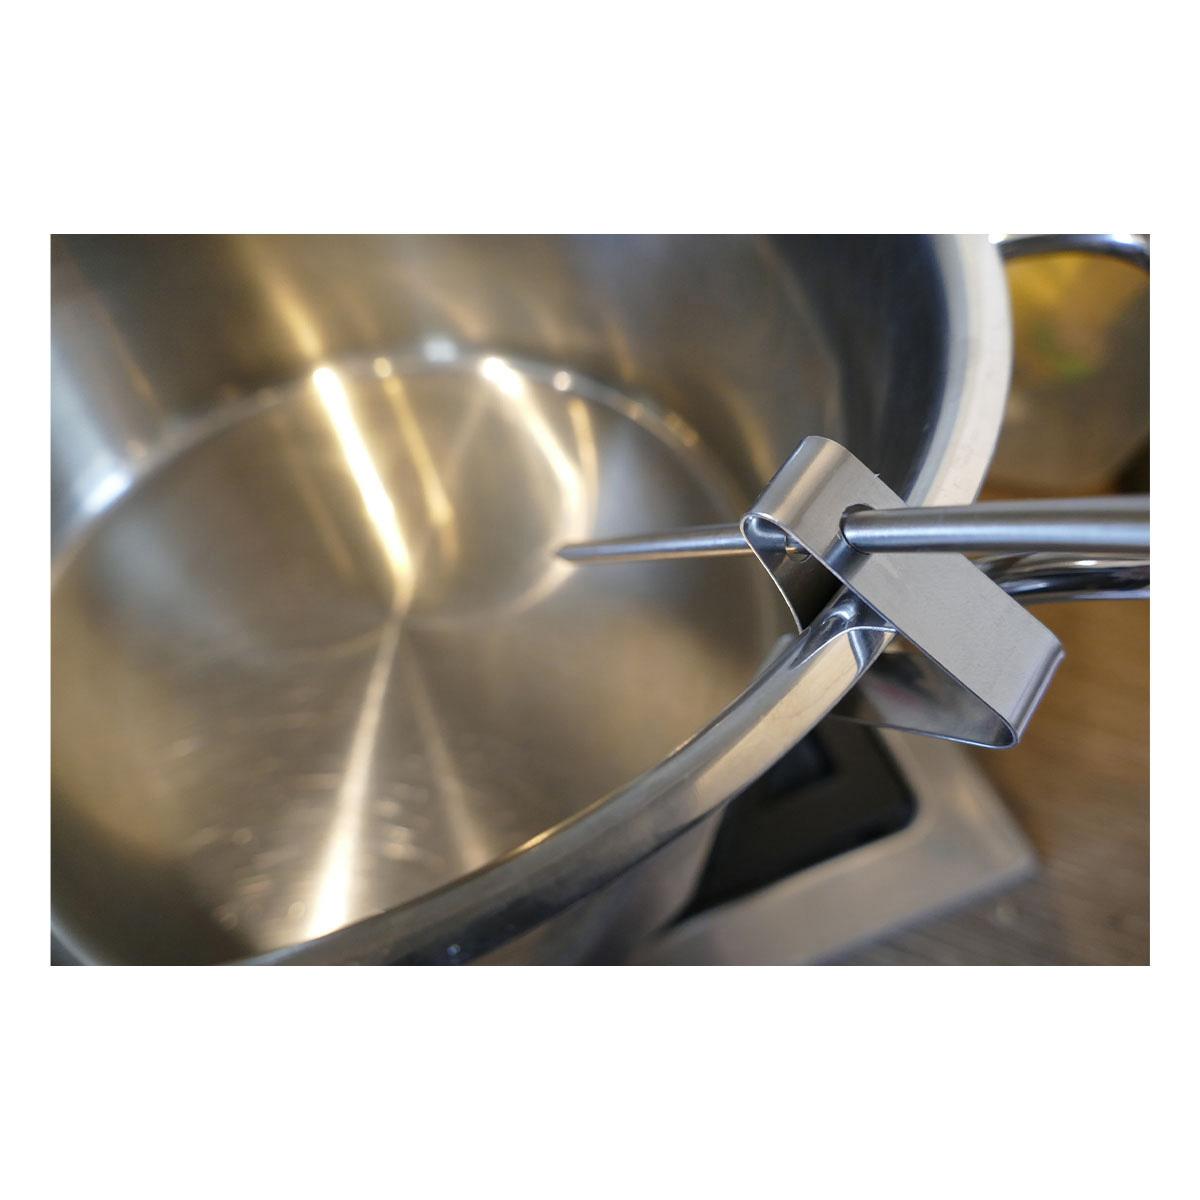 30-3525-60-clips-für-grill-bratenthermometer-anwendung-topf-1200x1200px.jpg